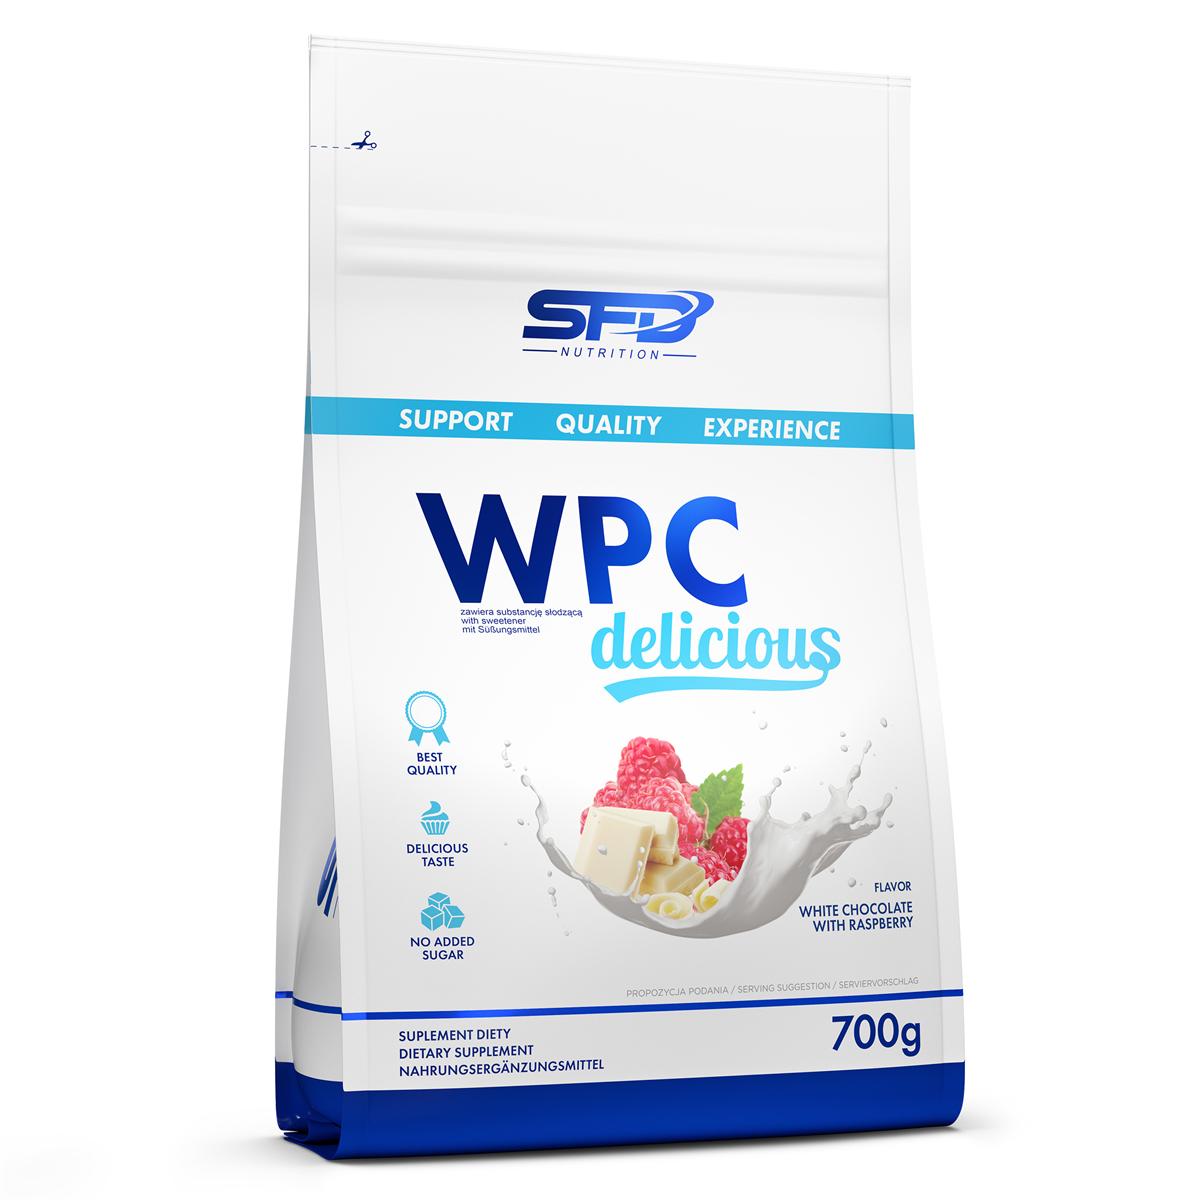 5f7f1c631c46 36 PLN • WPC Delicious Protein 700g - SFD NUTRITION • NAJTANIEJ ...